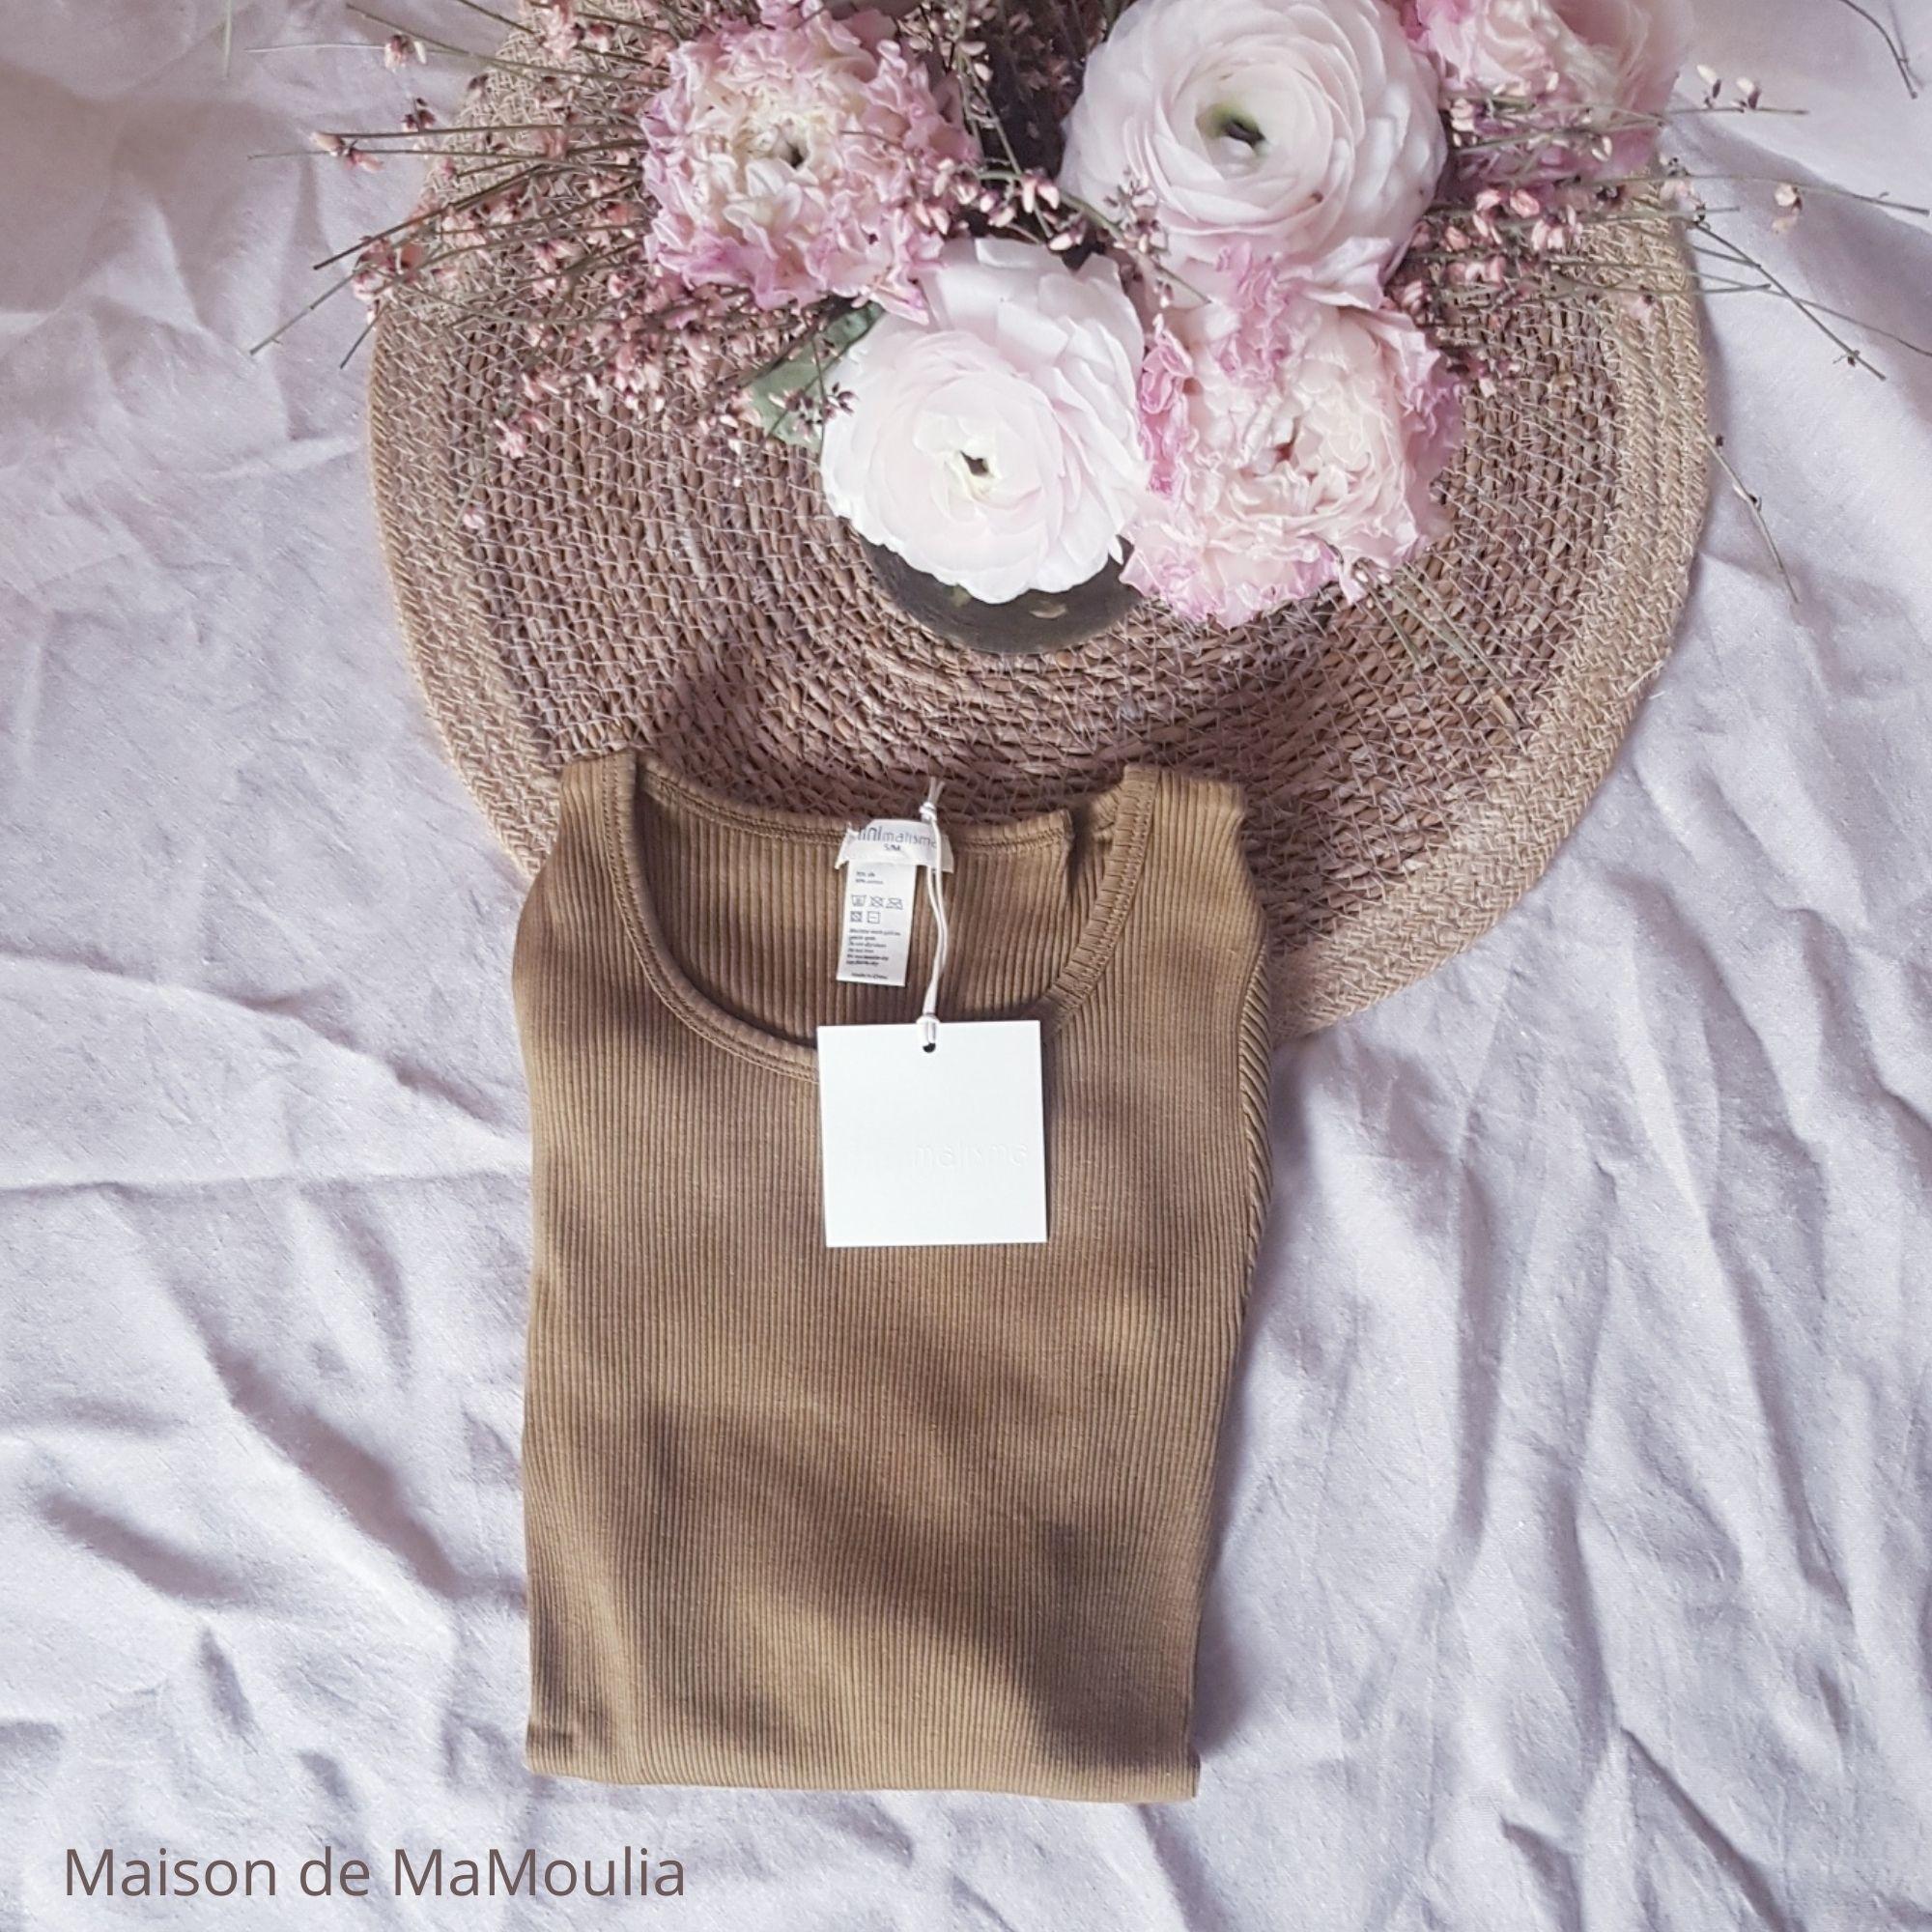 MINIMALISMA - Top pour femme - manches longues - Soie 70% / coton 30% - Gerda - Seaweed